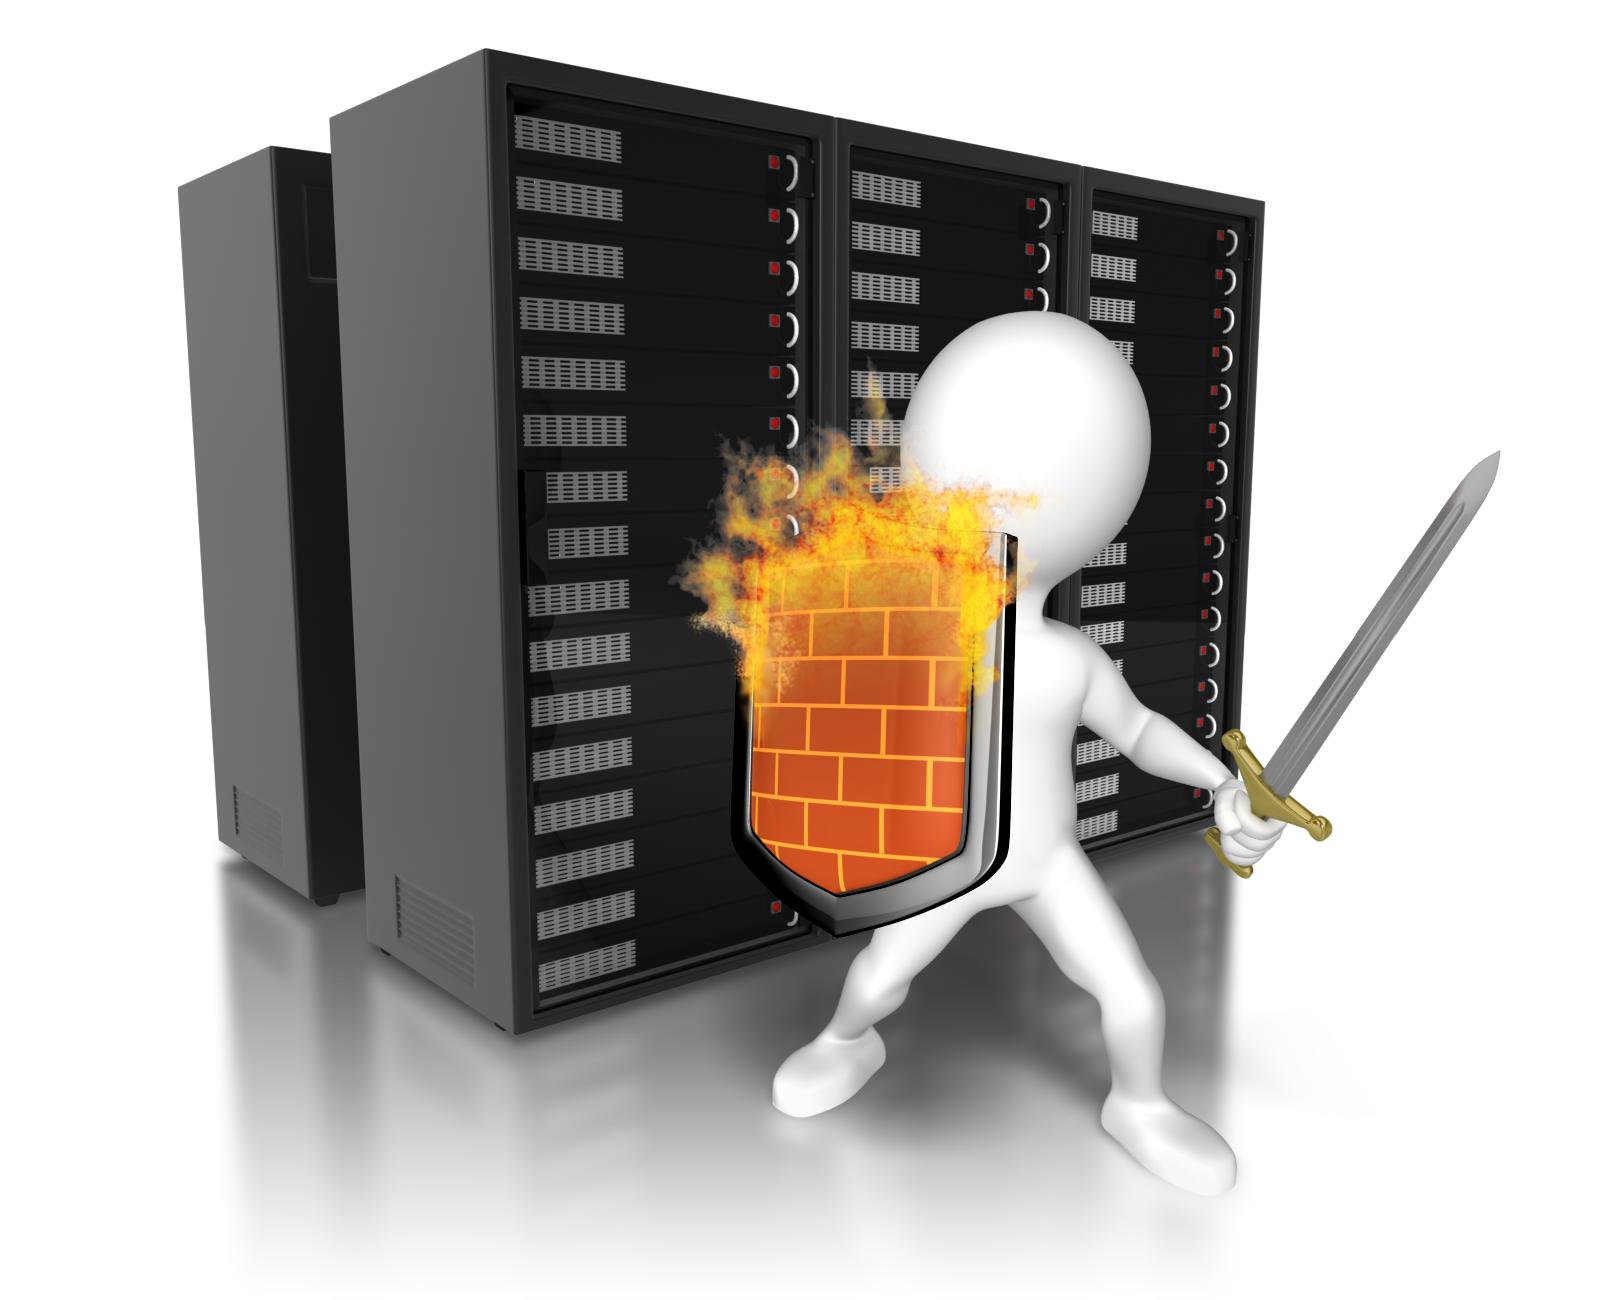 migliori-firewall-gratuiti-2015